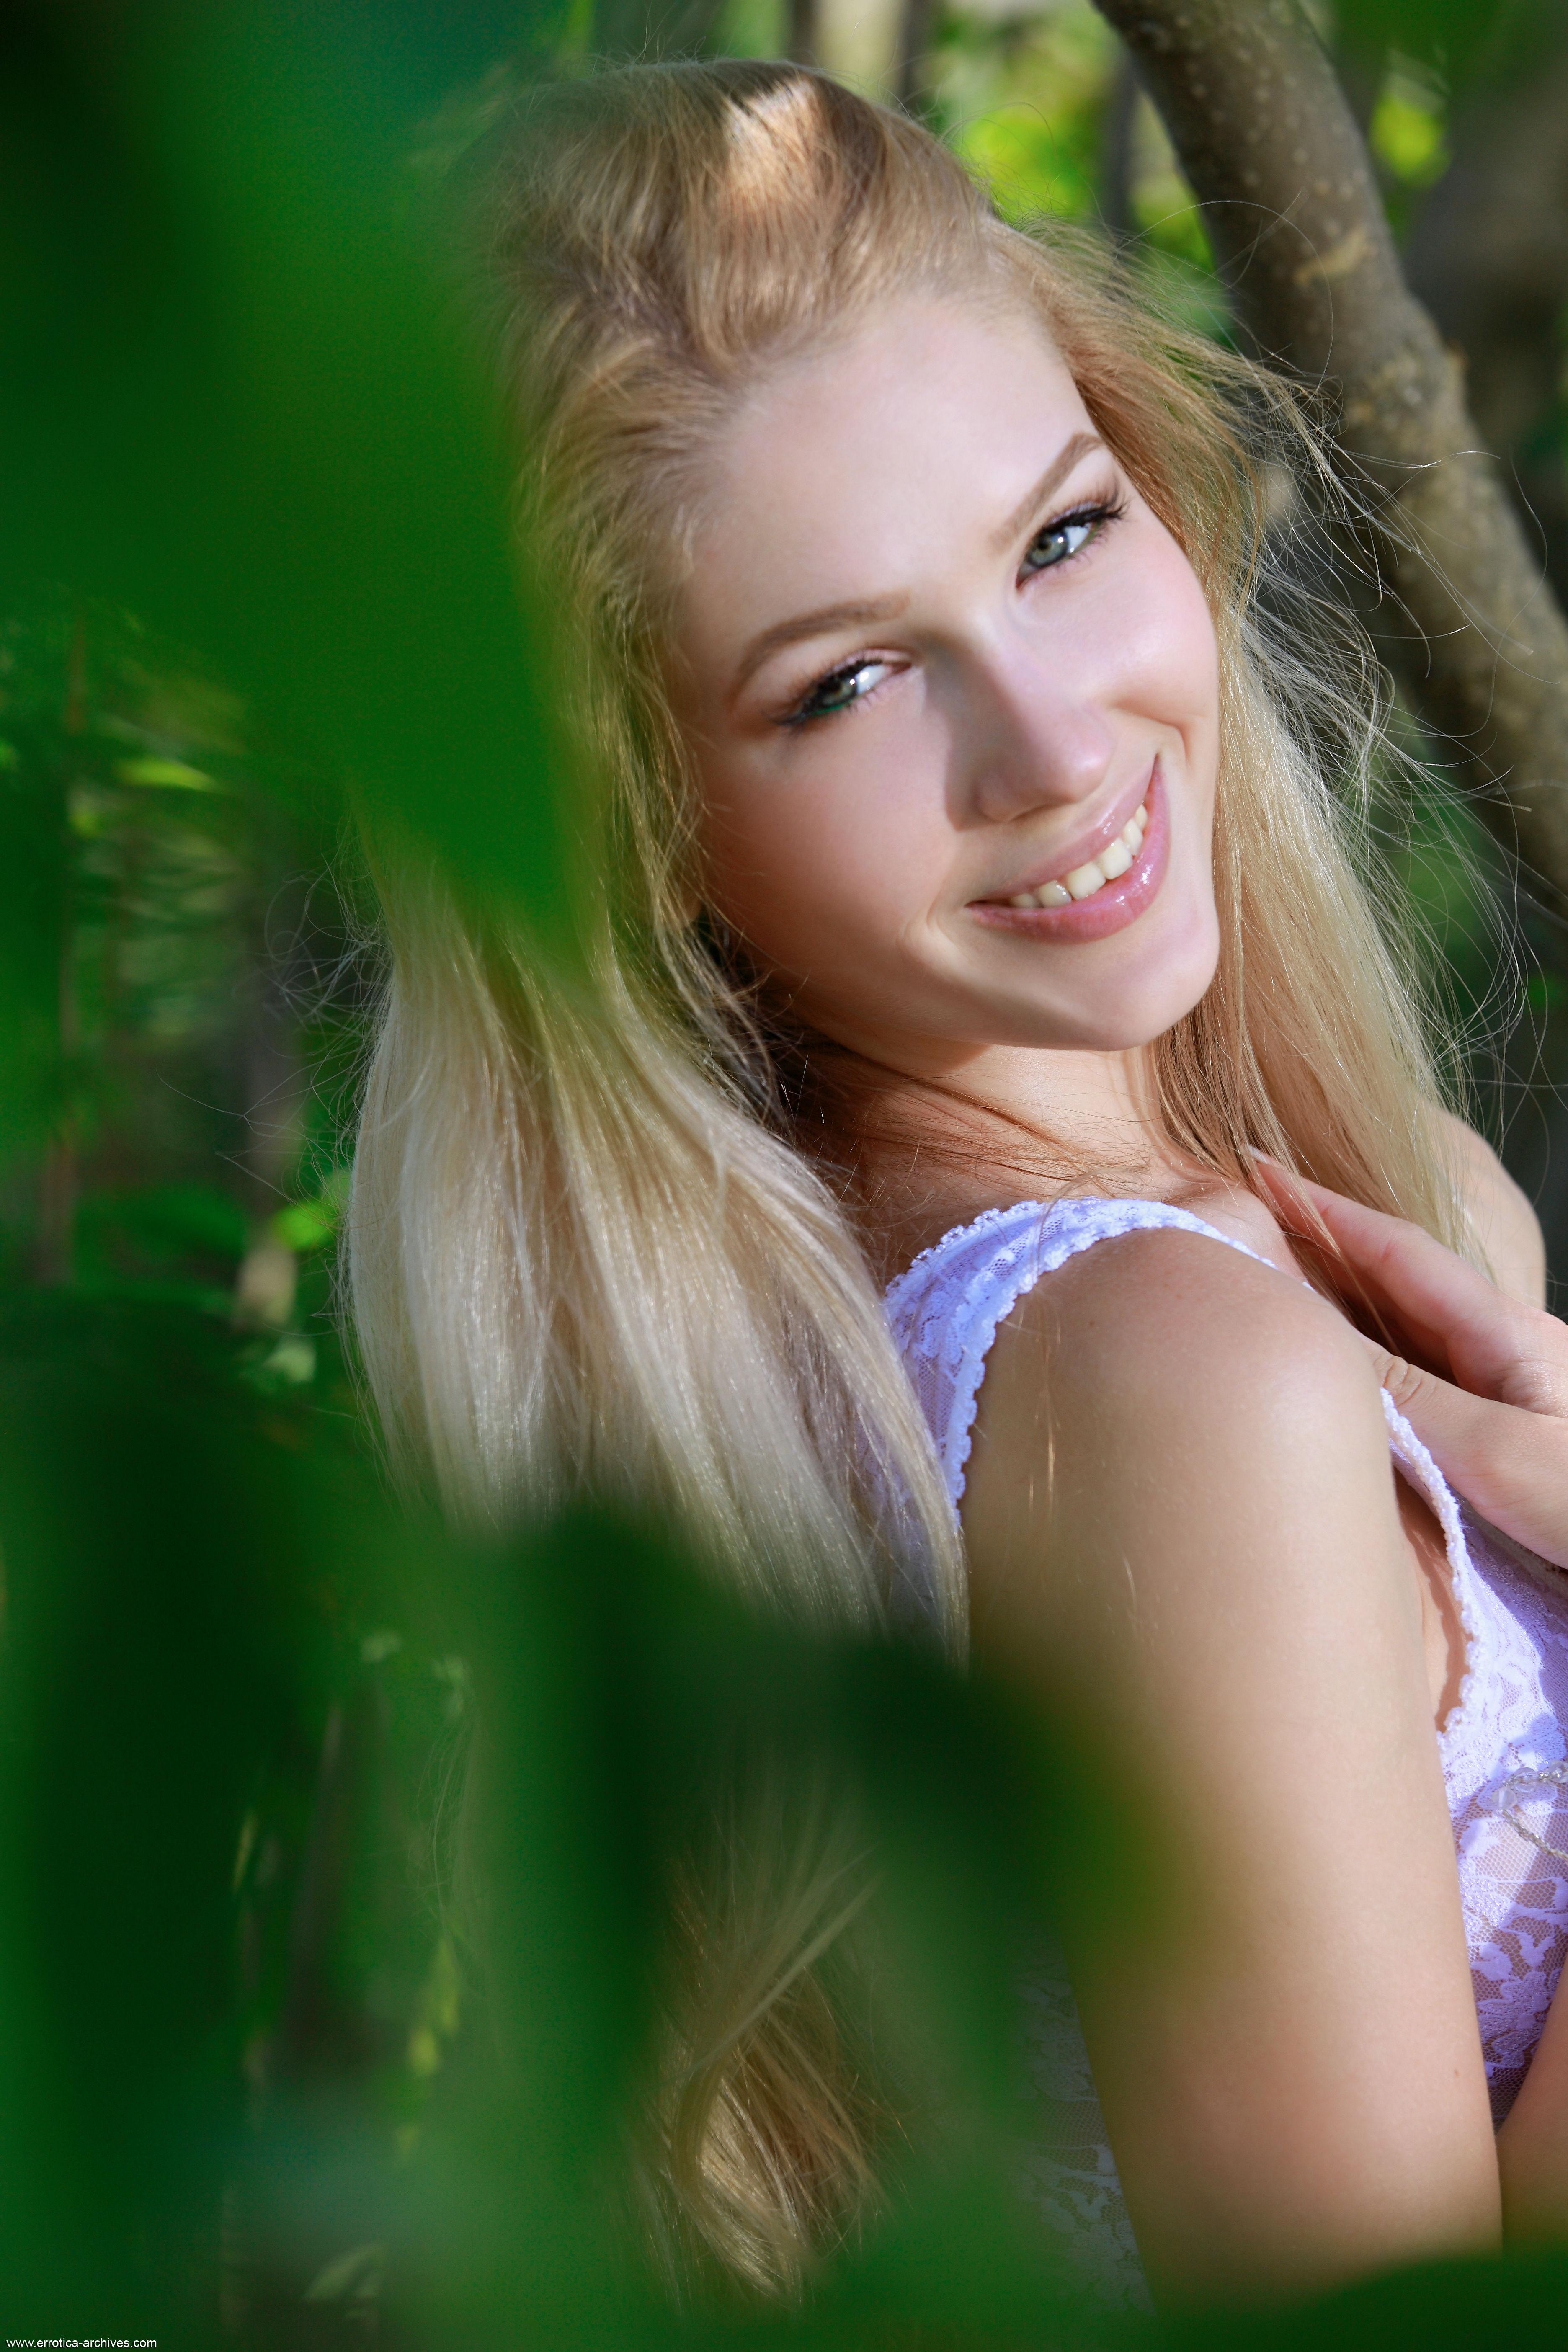 Women Women Outdoors Marianna Merkulova Blonde Errotica Archives Bodysuit See Through Clothing Face Smiling Portrait Display